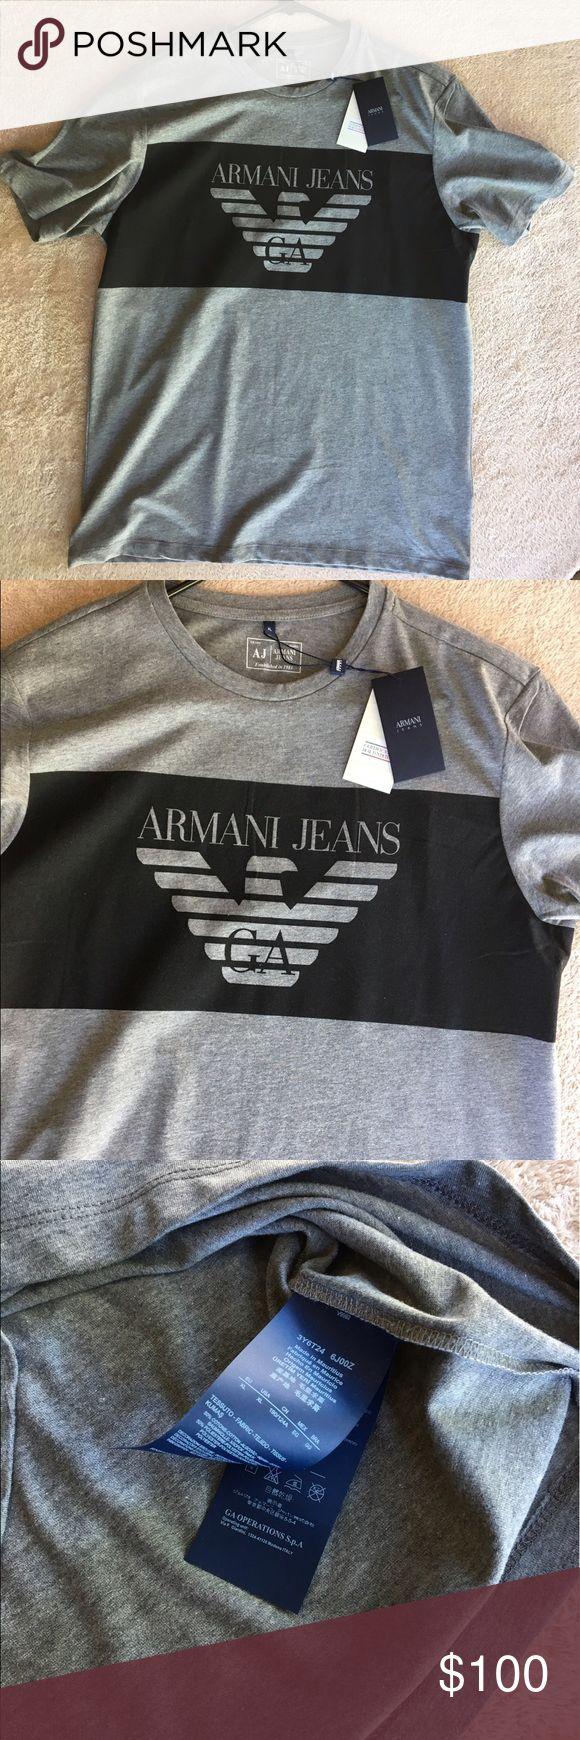 Armani Jeans T-shirt Grey cotton logo print T-shirt from Armani Jeans. Composition: Cotton 100% Washing Instructions: Machine Wash Armani Jeans Shirts Tees - Short Sleeve